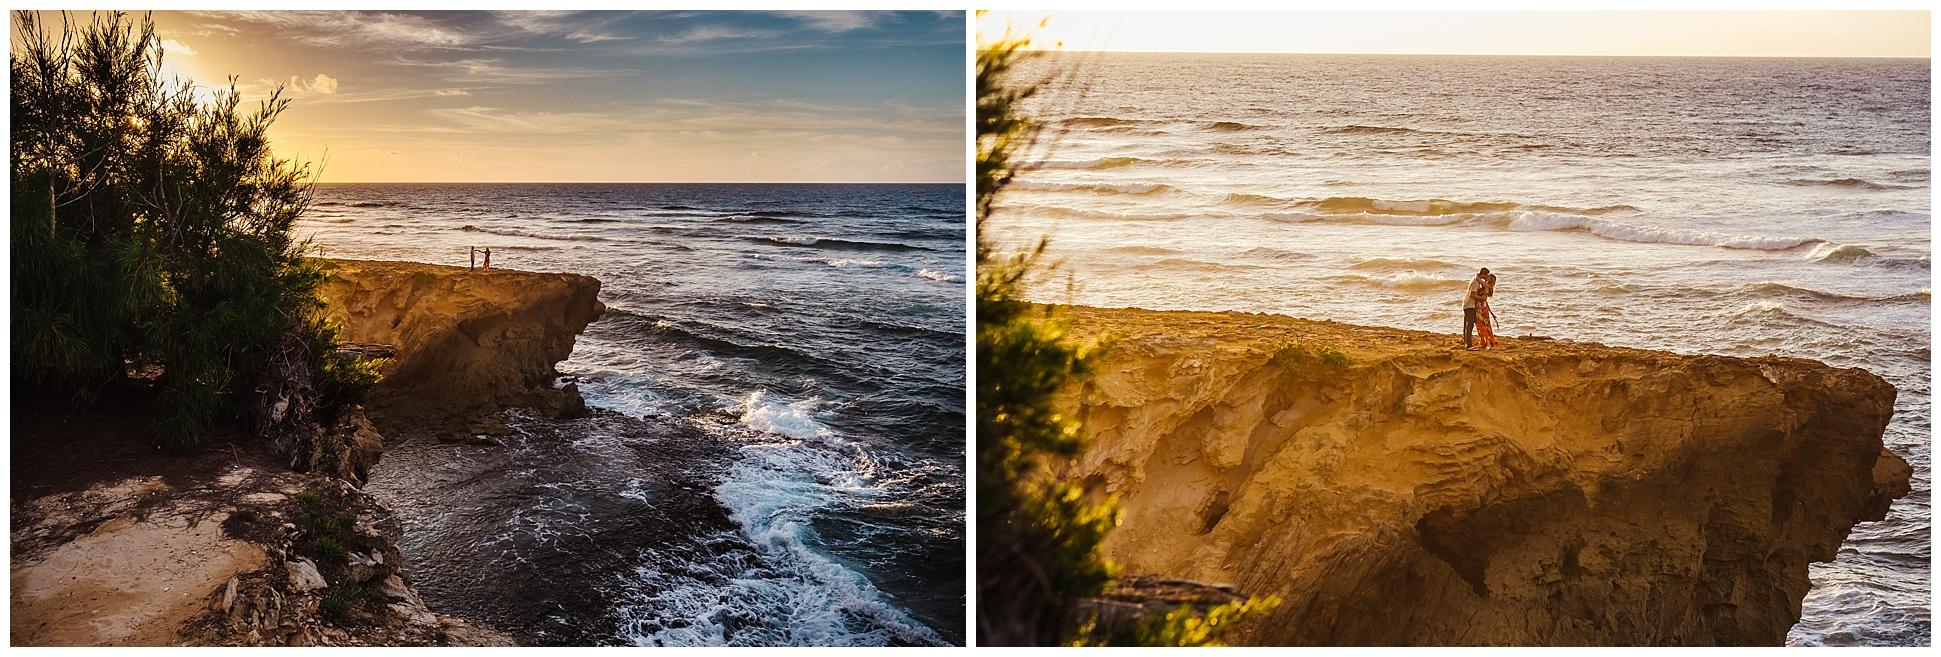 hawaiin-honeymoon-sunrise-portraits-kauai-grand-hystt-destination-photographer_0011.jpg